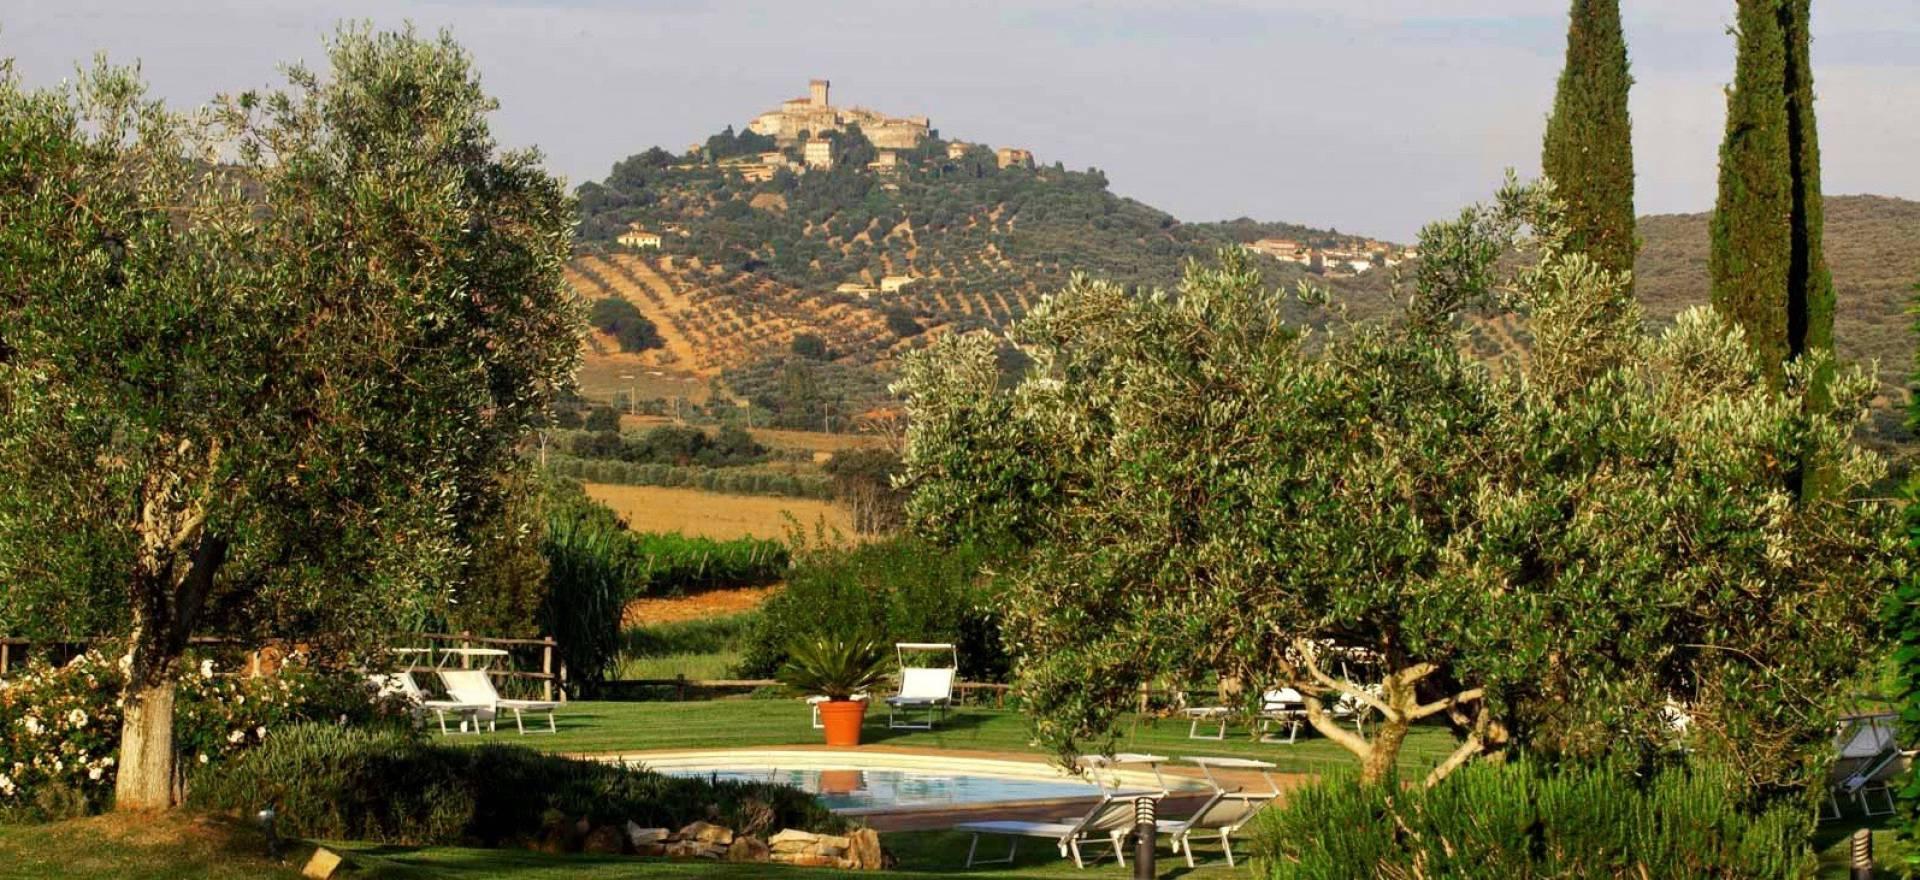 Agriturismo Toscana Agriturismo romantico Toscana sulle colline vicino al mare